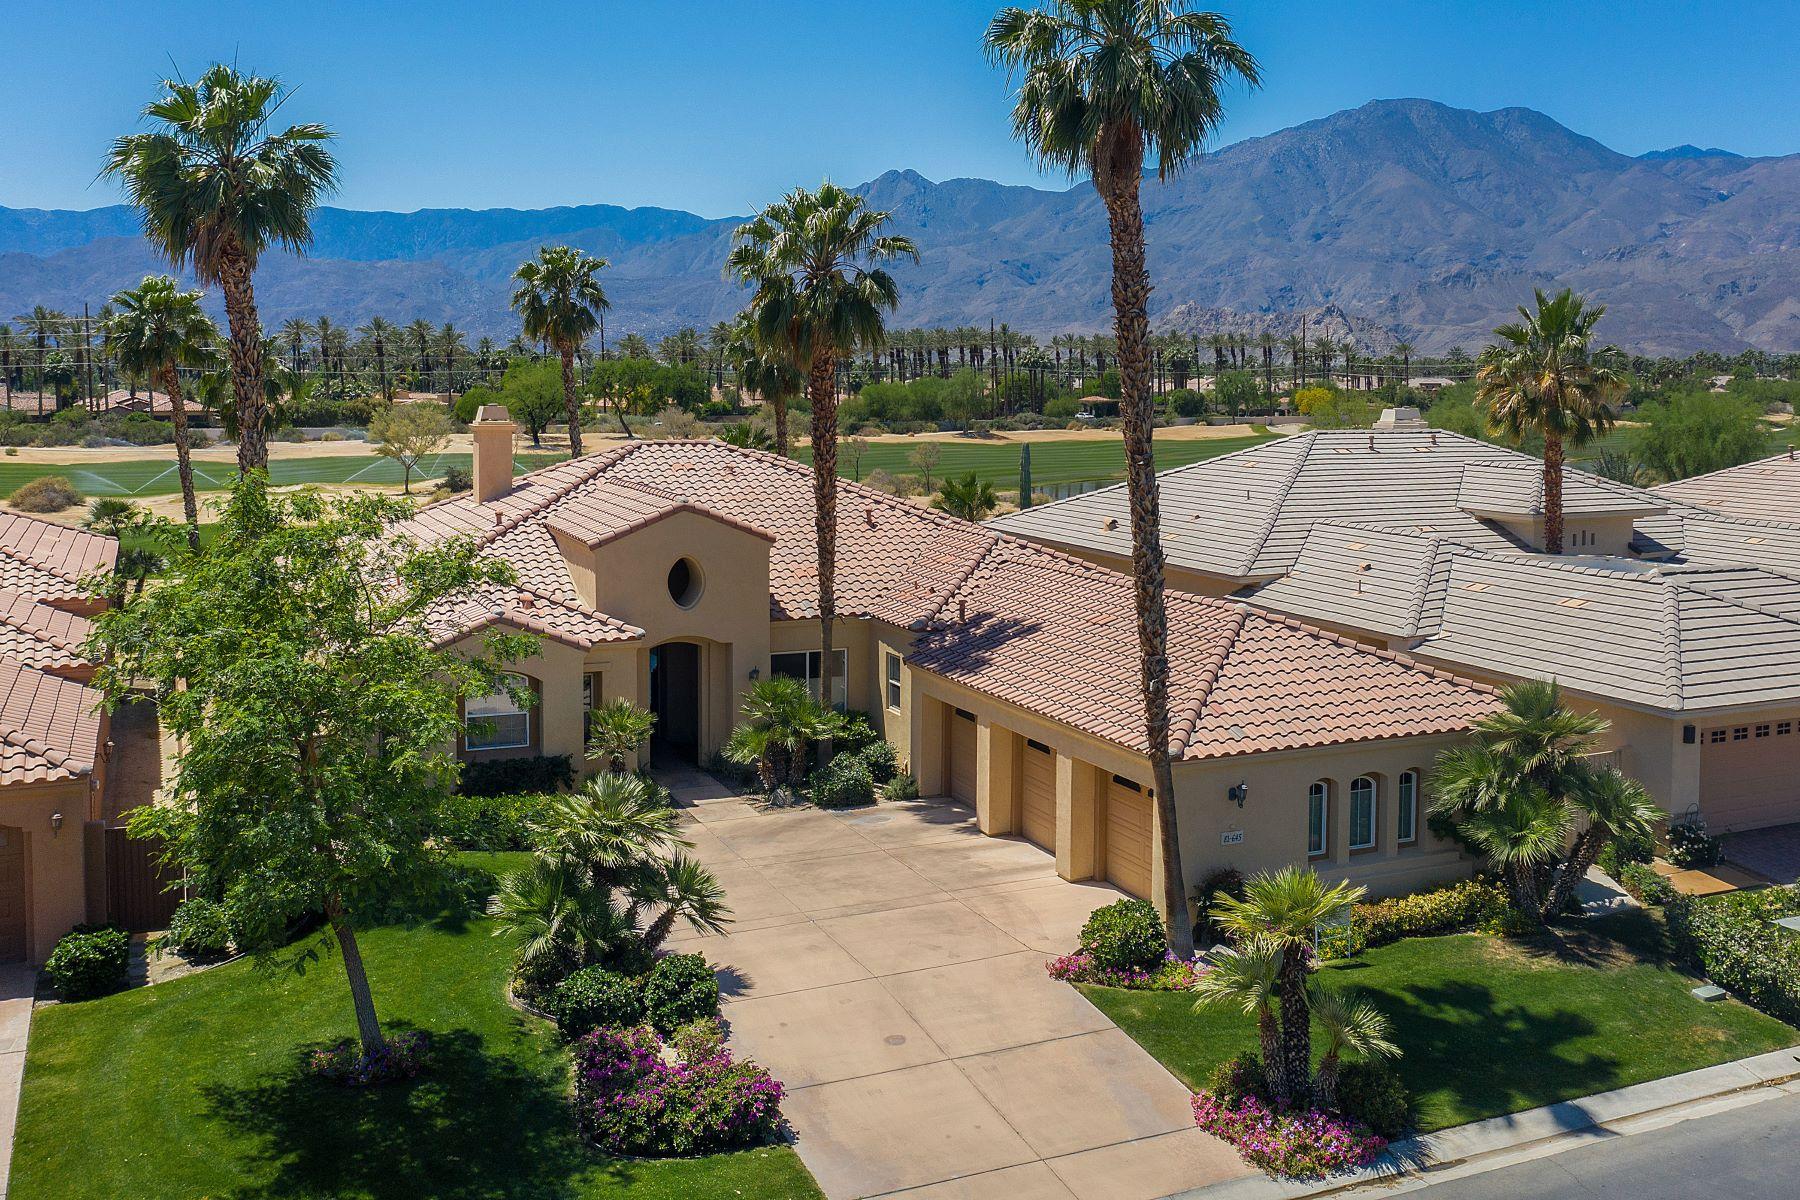 Single Family Homes for Sale at 81645 Tiburon Drive La Quinta, California 92253 United States